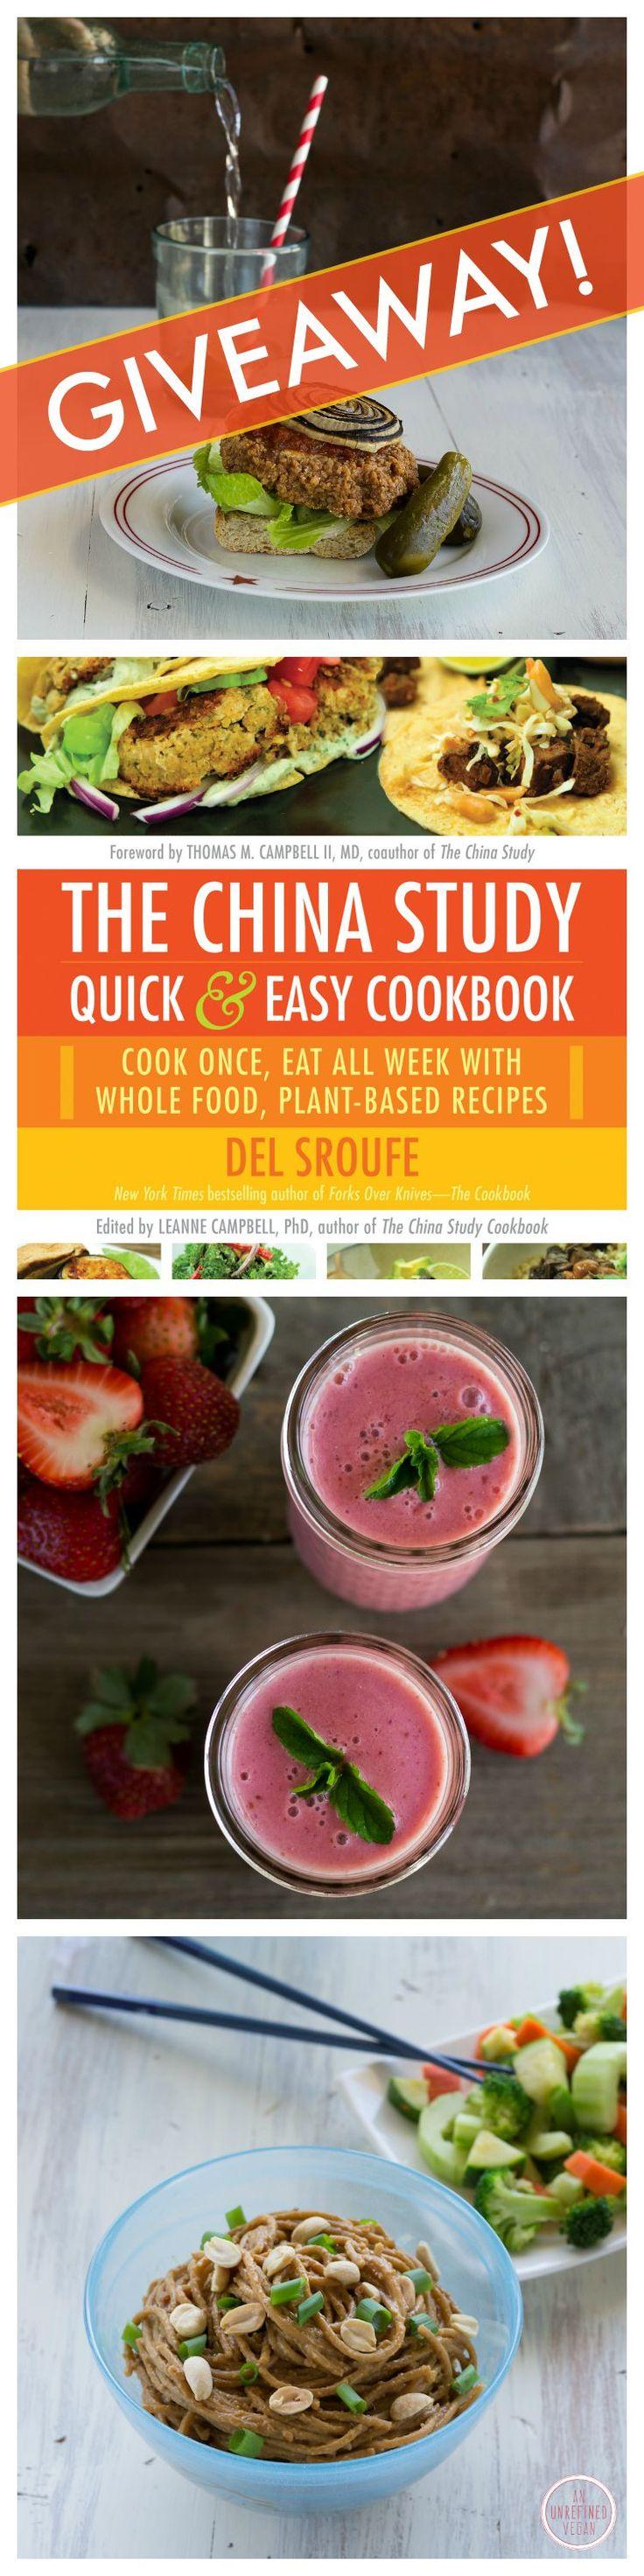 Plant-Based Diet Recipes - Center for Nutrition Studies